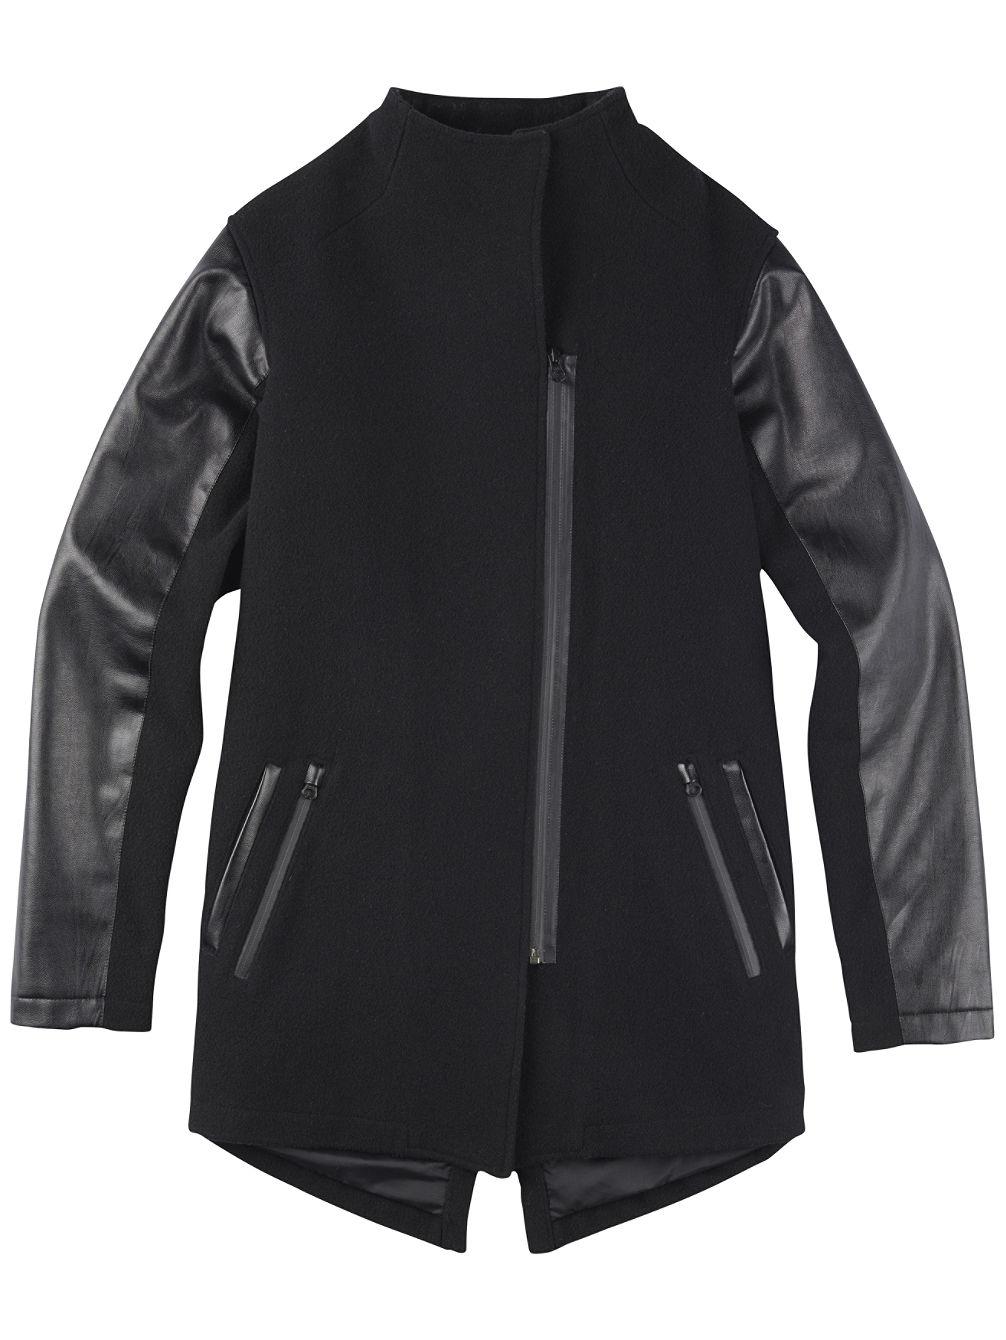 burton-regent-jacket